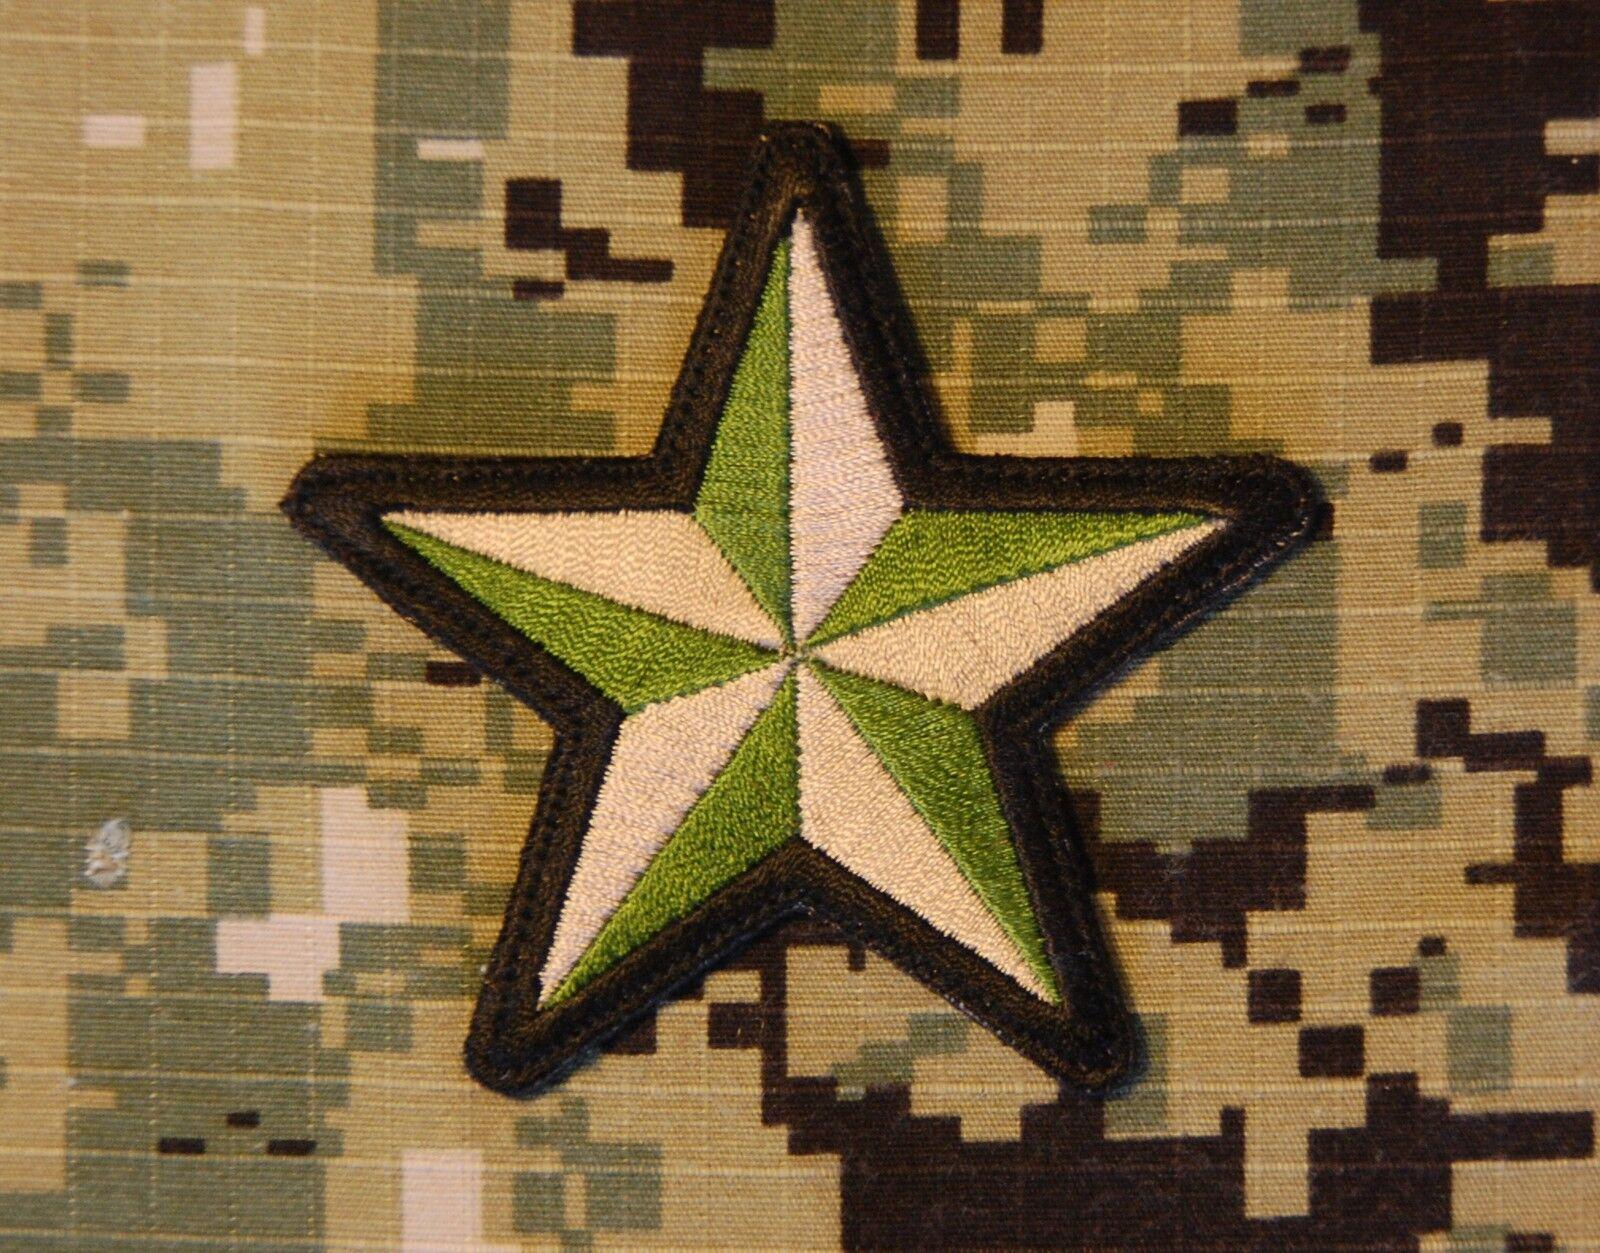 Nautical Star US Navy USN USMC AOR1 NWU Type II MARPAT NSW SEAL Morale Patch